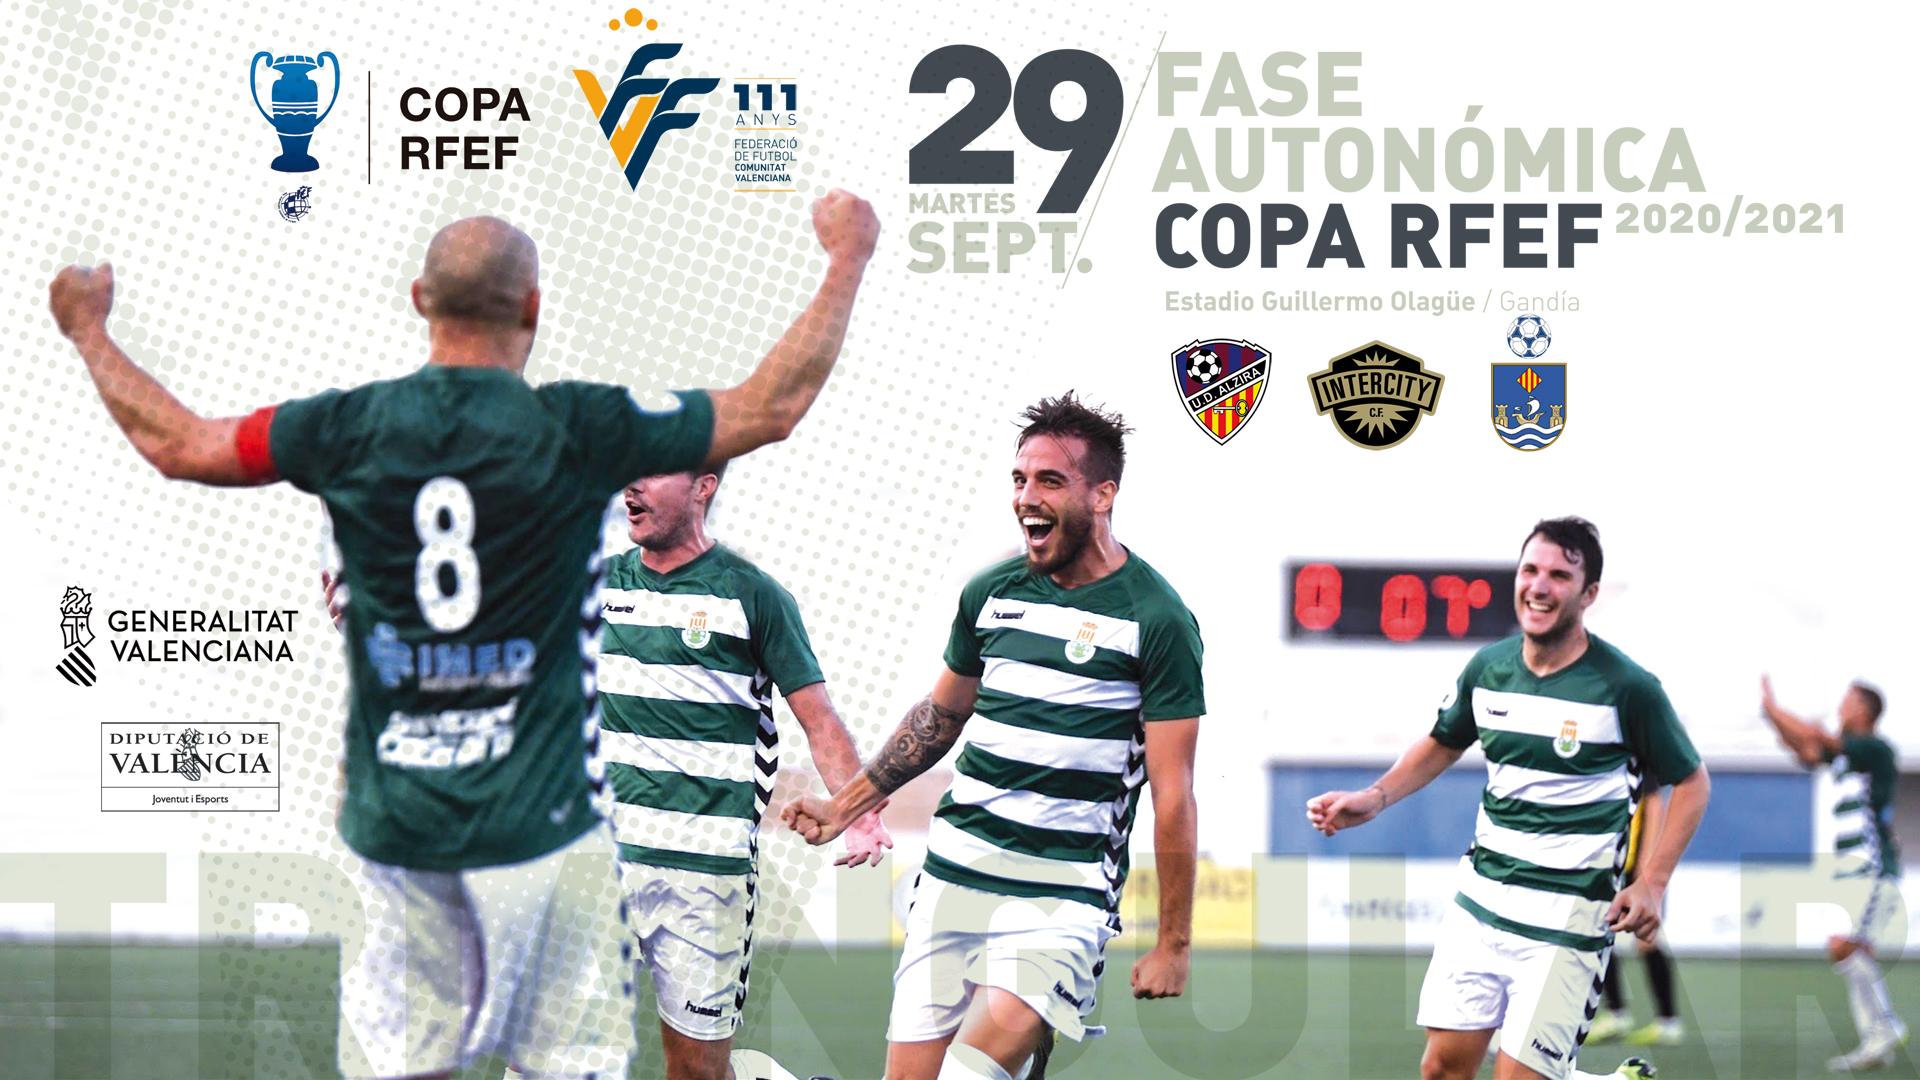 Fase autonómica Copa RFEF 2020 banner